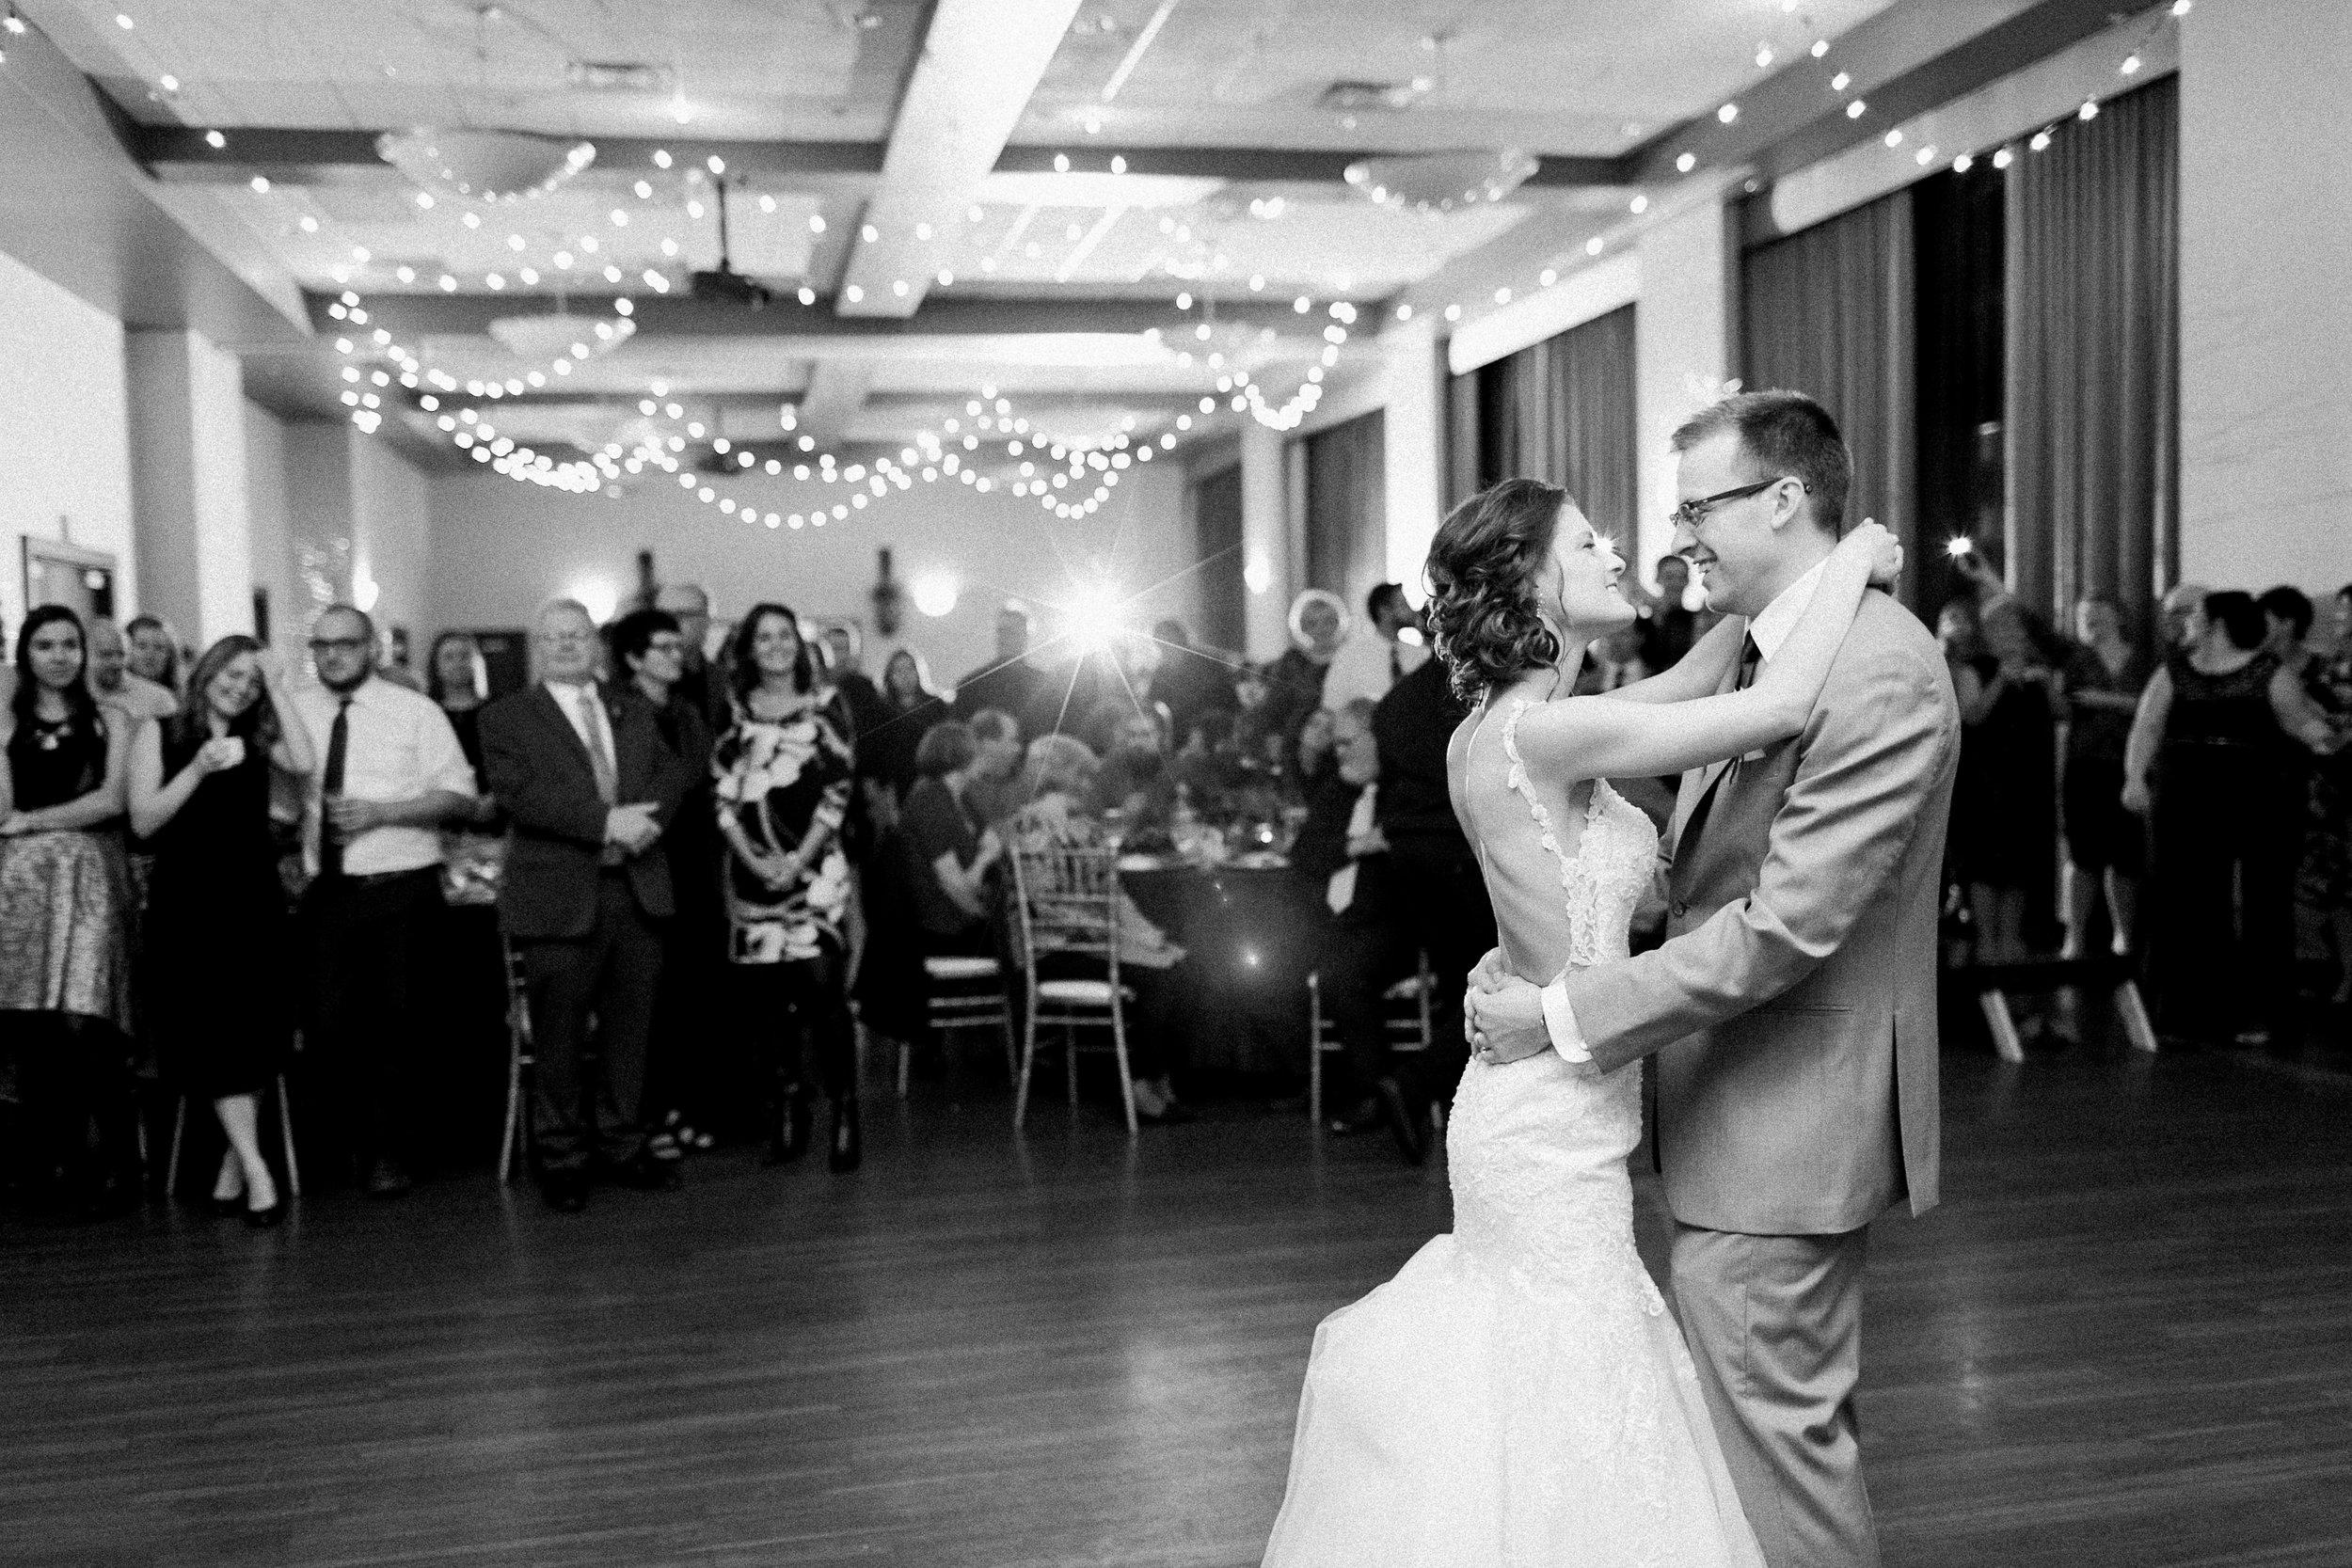 2017_Carly_Milbrath_Jefferson_Street_Inn_Wedding_Wausau_WI_561.JPG